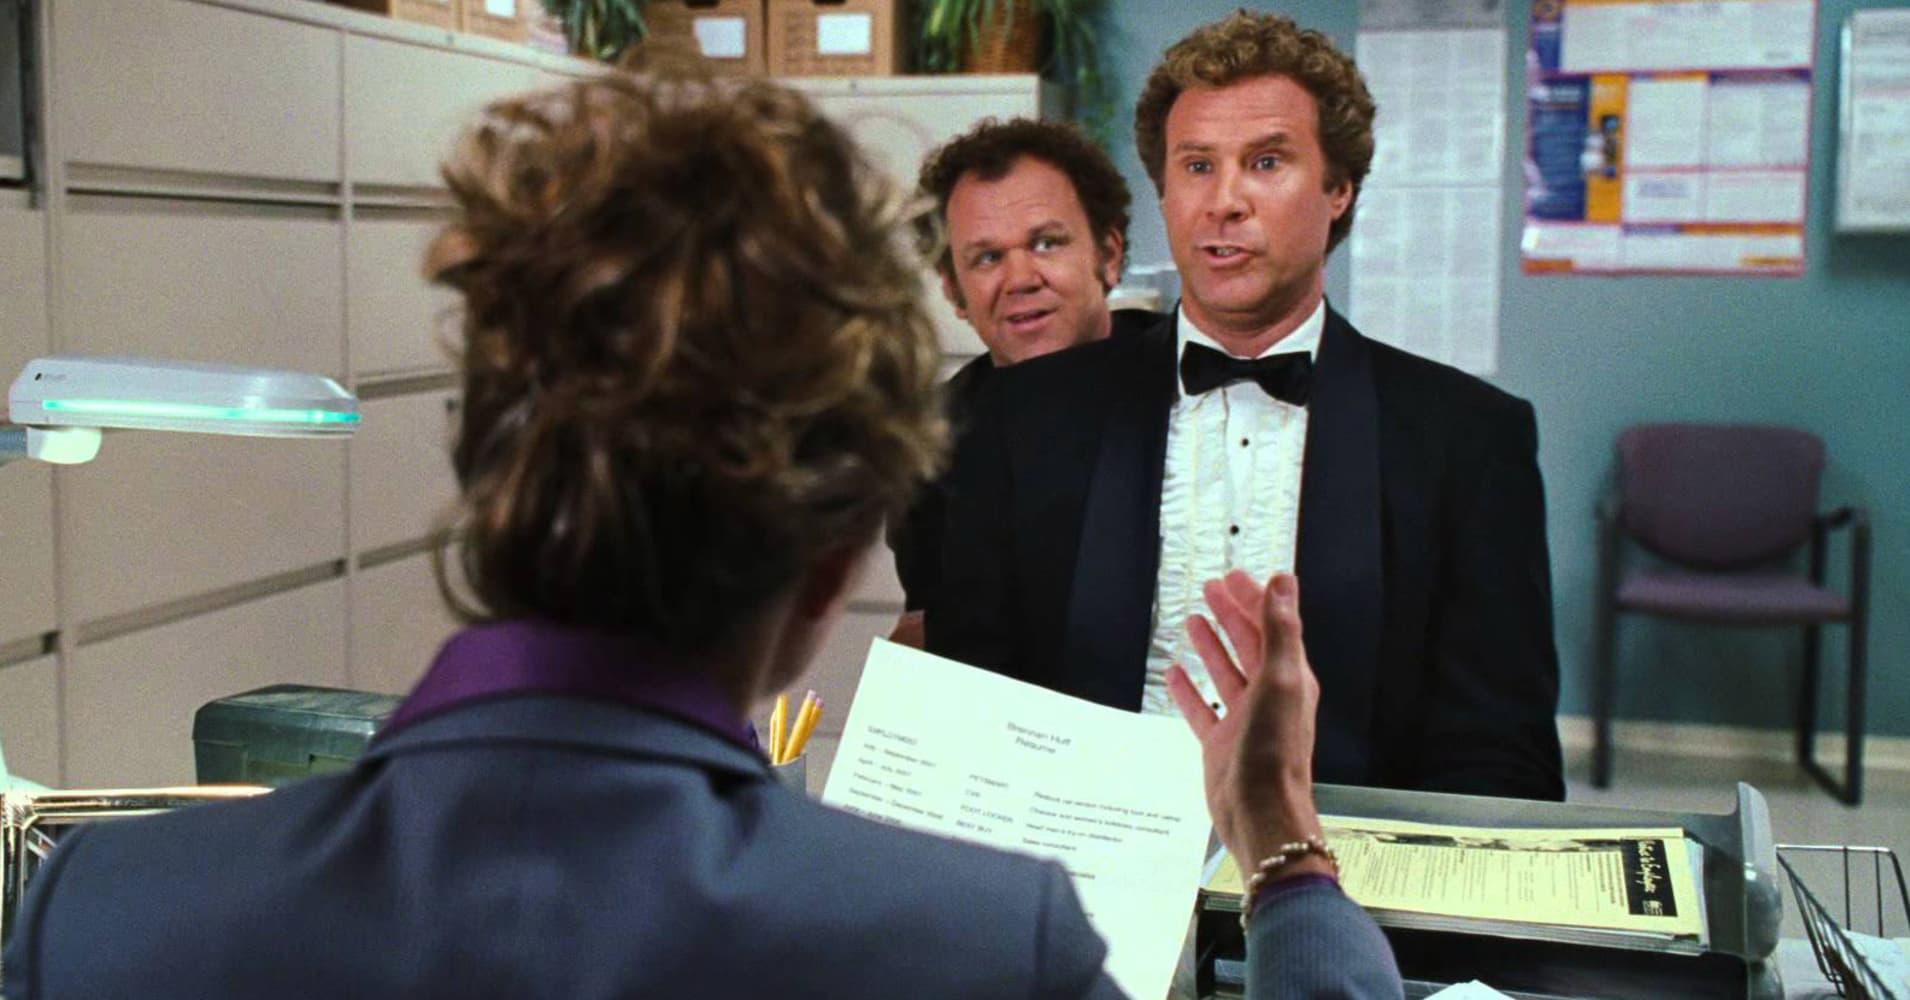 simon sinek u0026 39 s trick to be better at job interviews